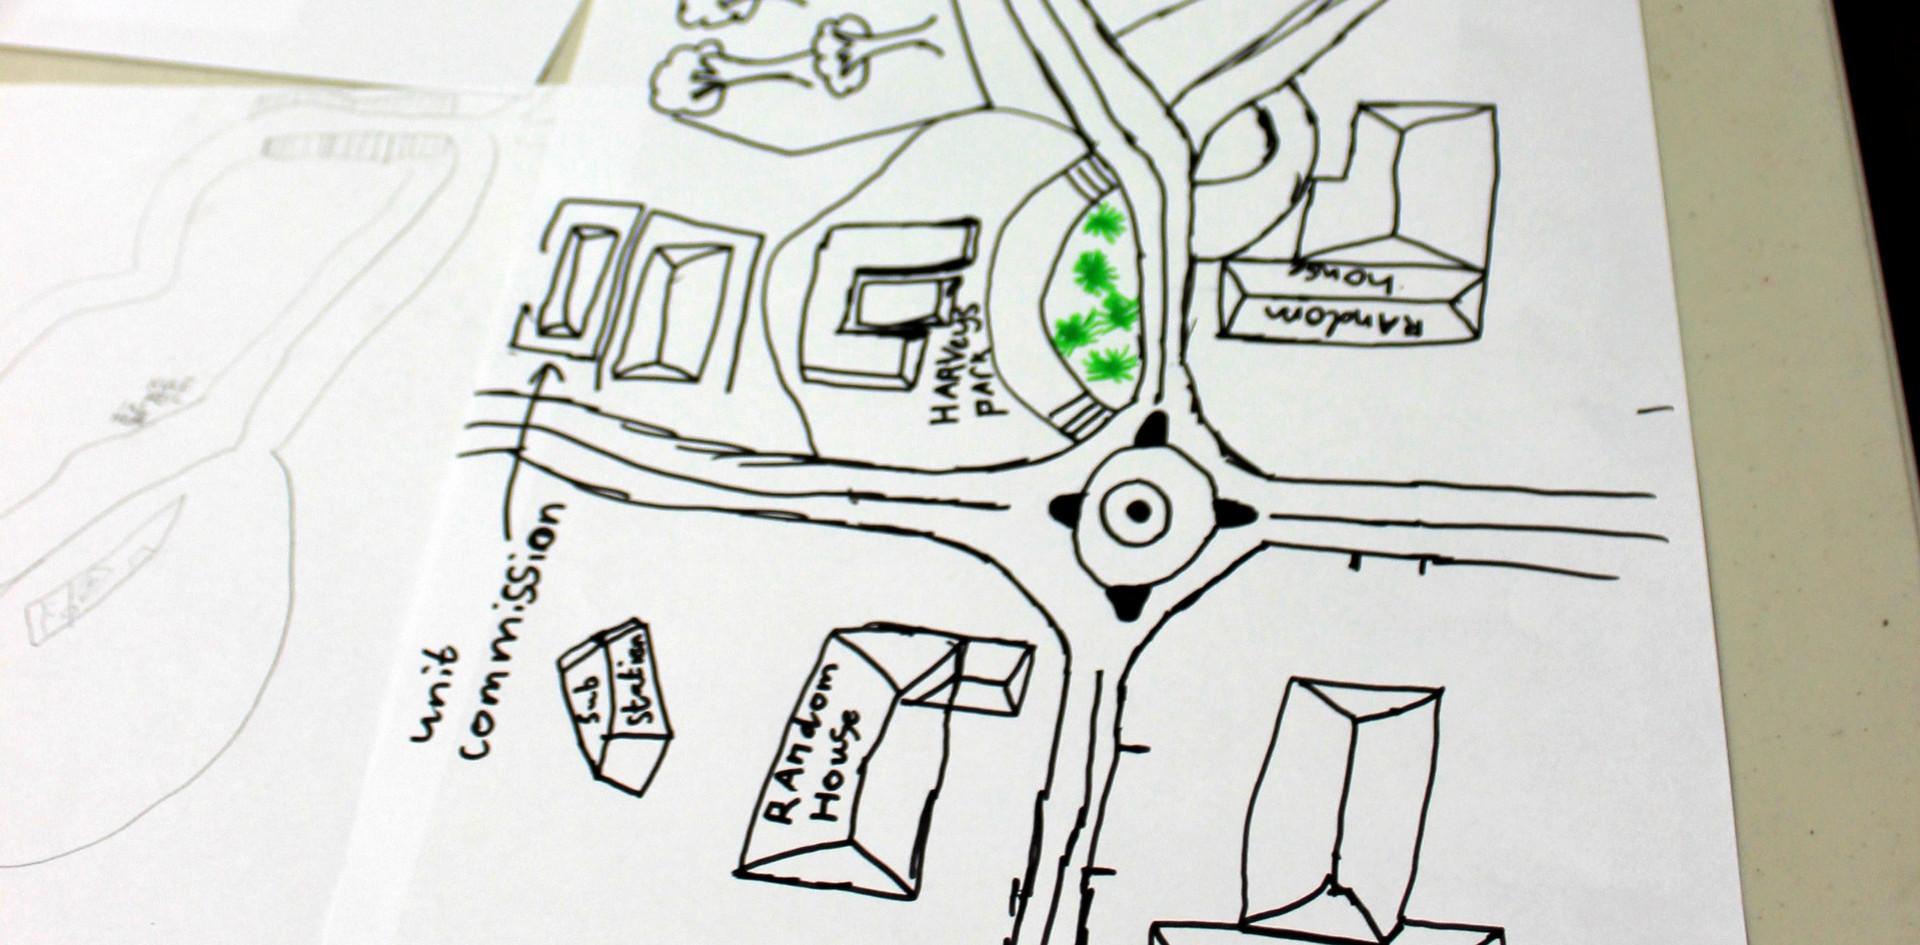 Cygnet map designed by school kids